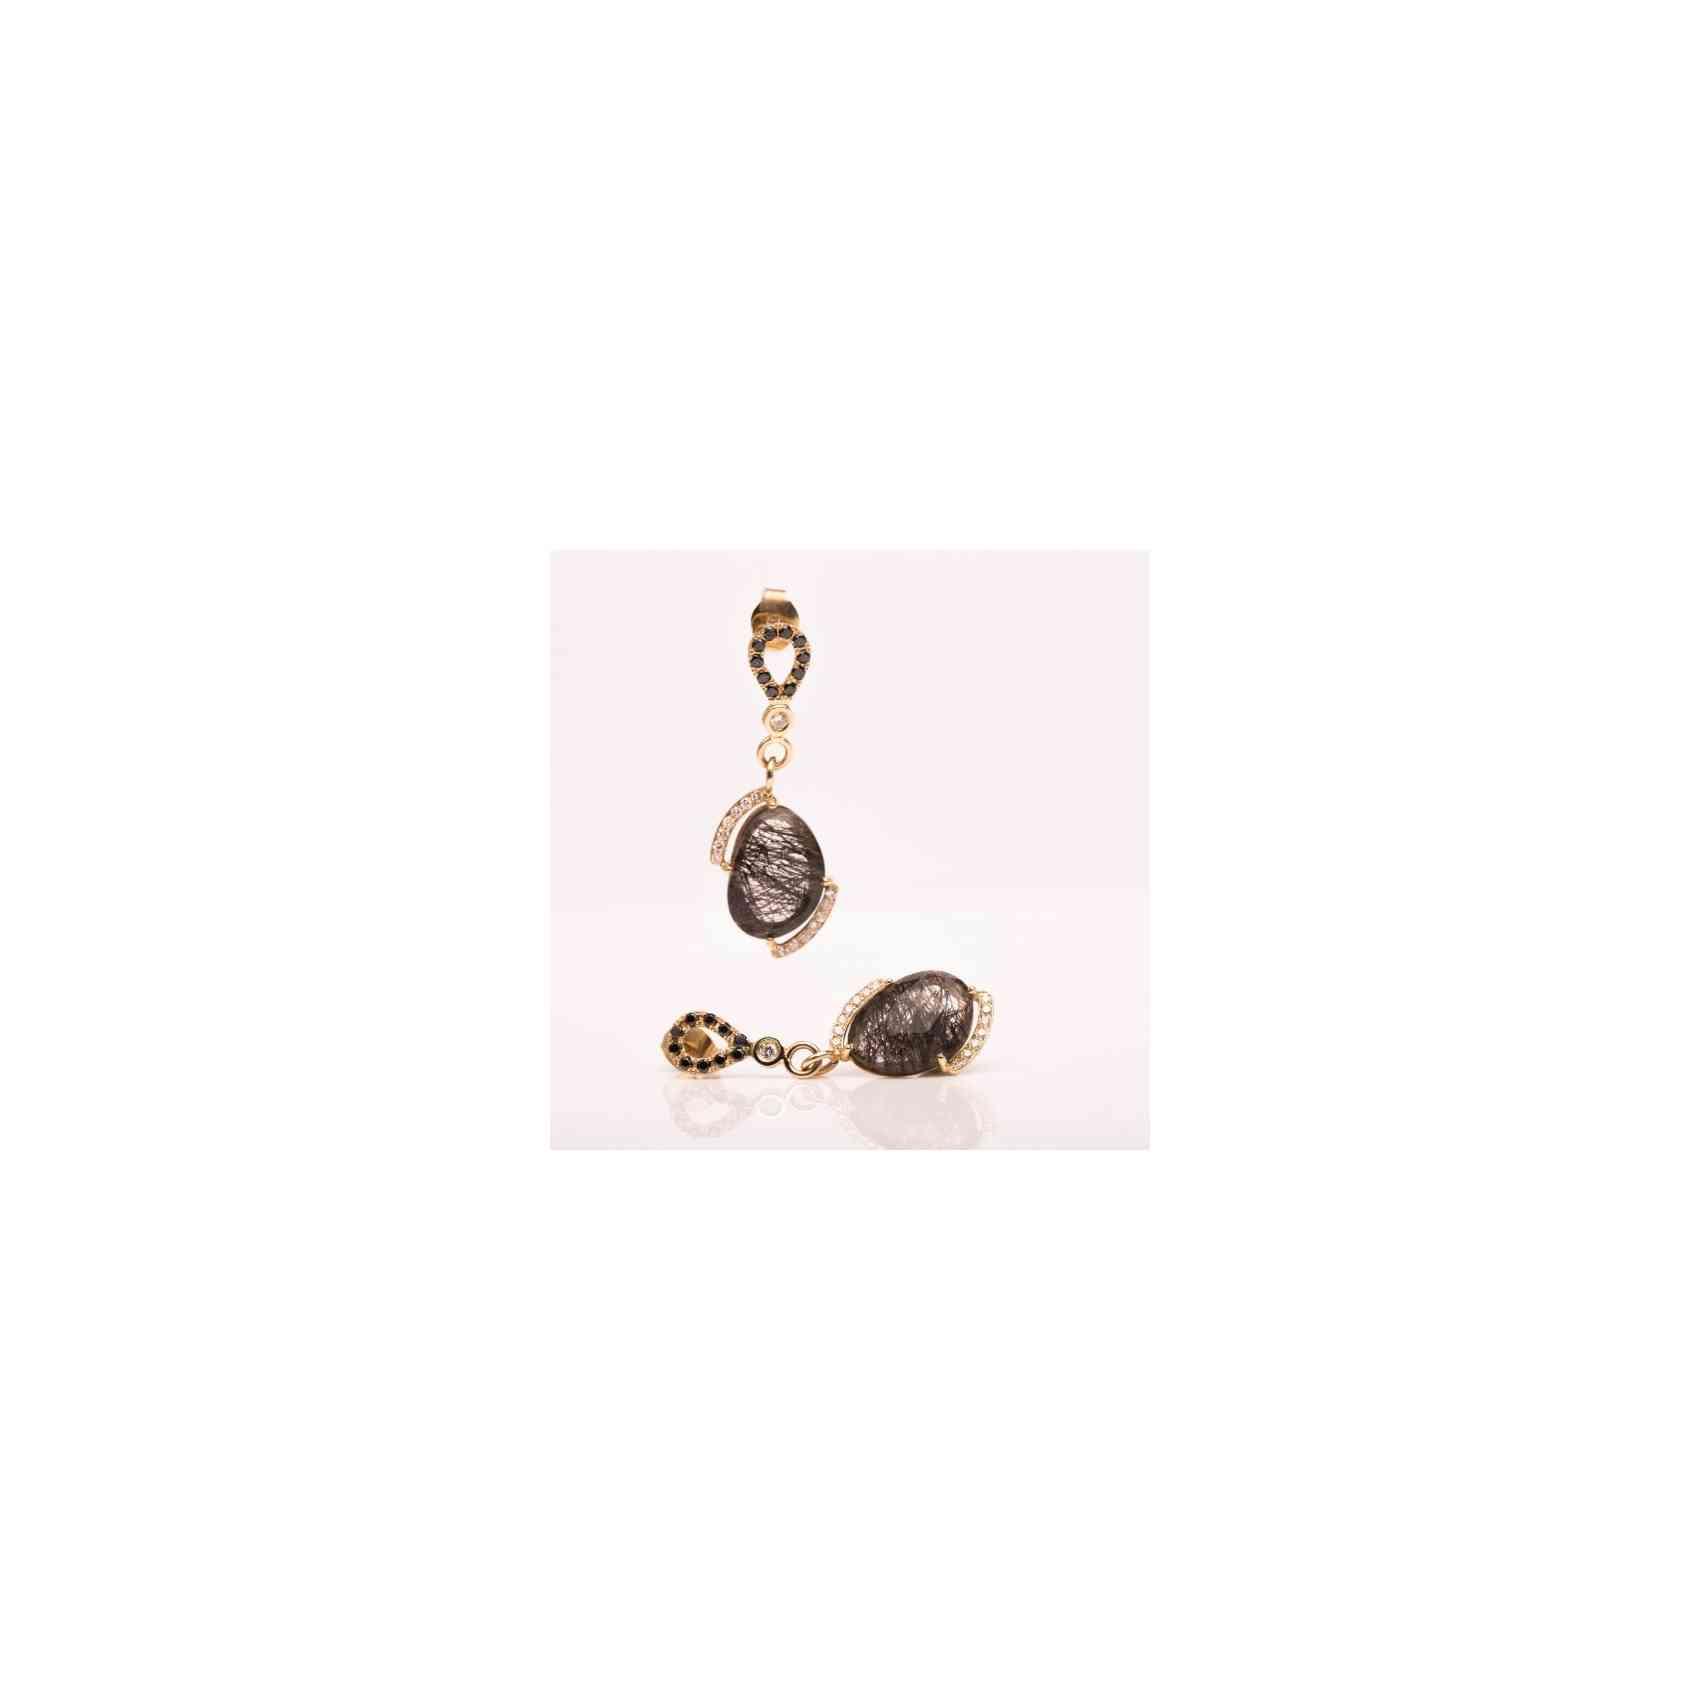 Cercei Aur 18K cu Diamante și Quarț